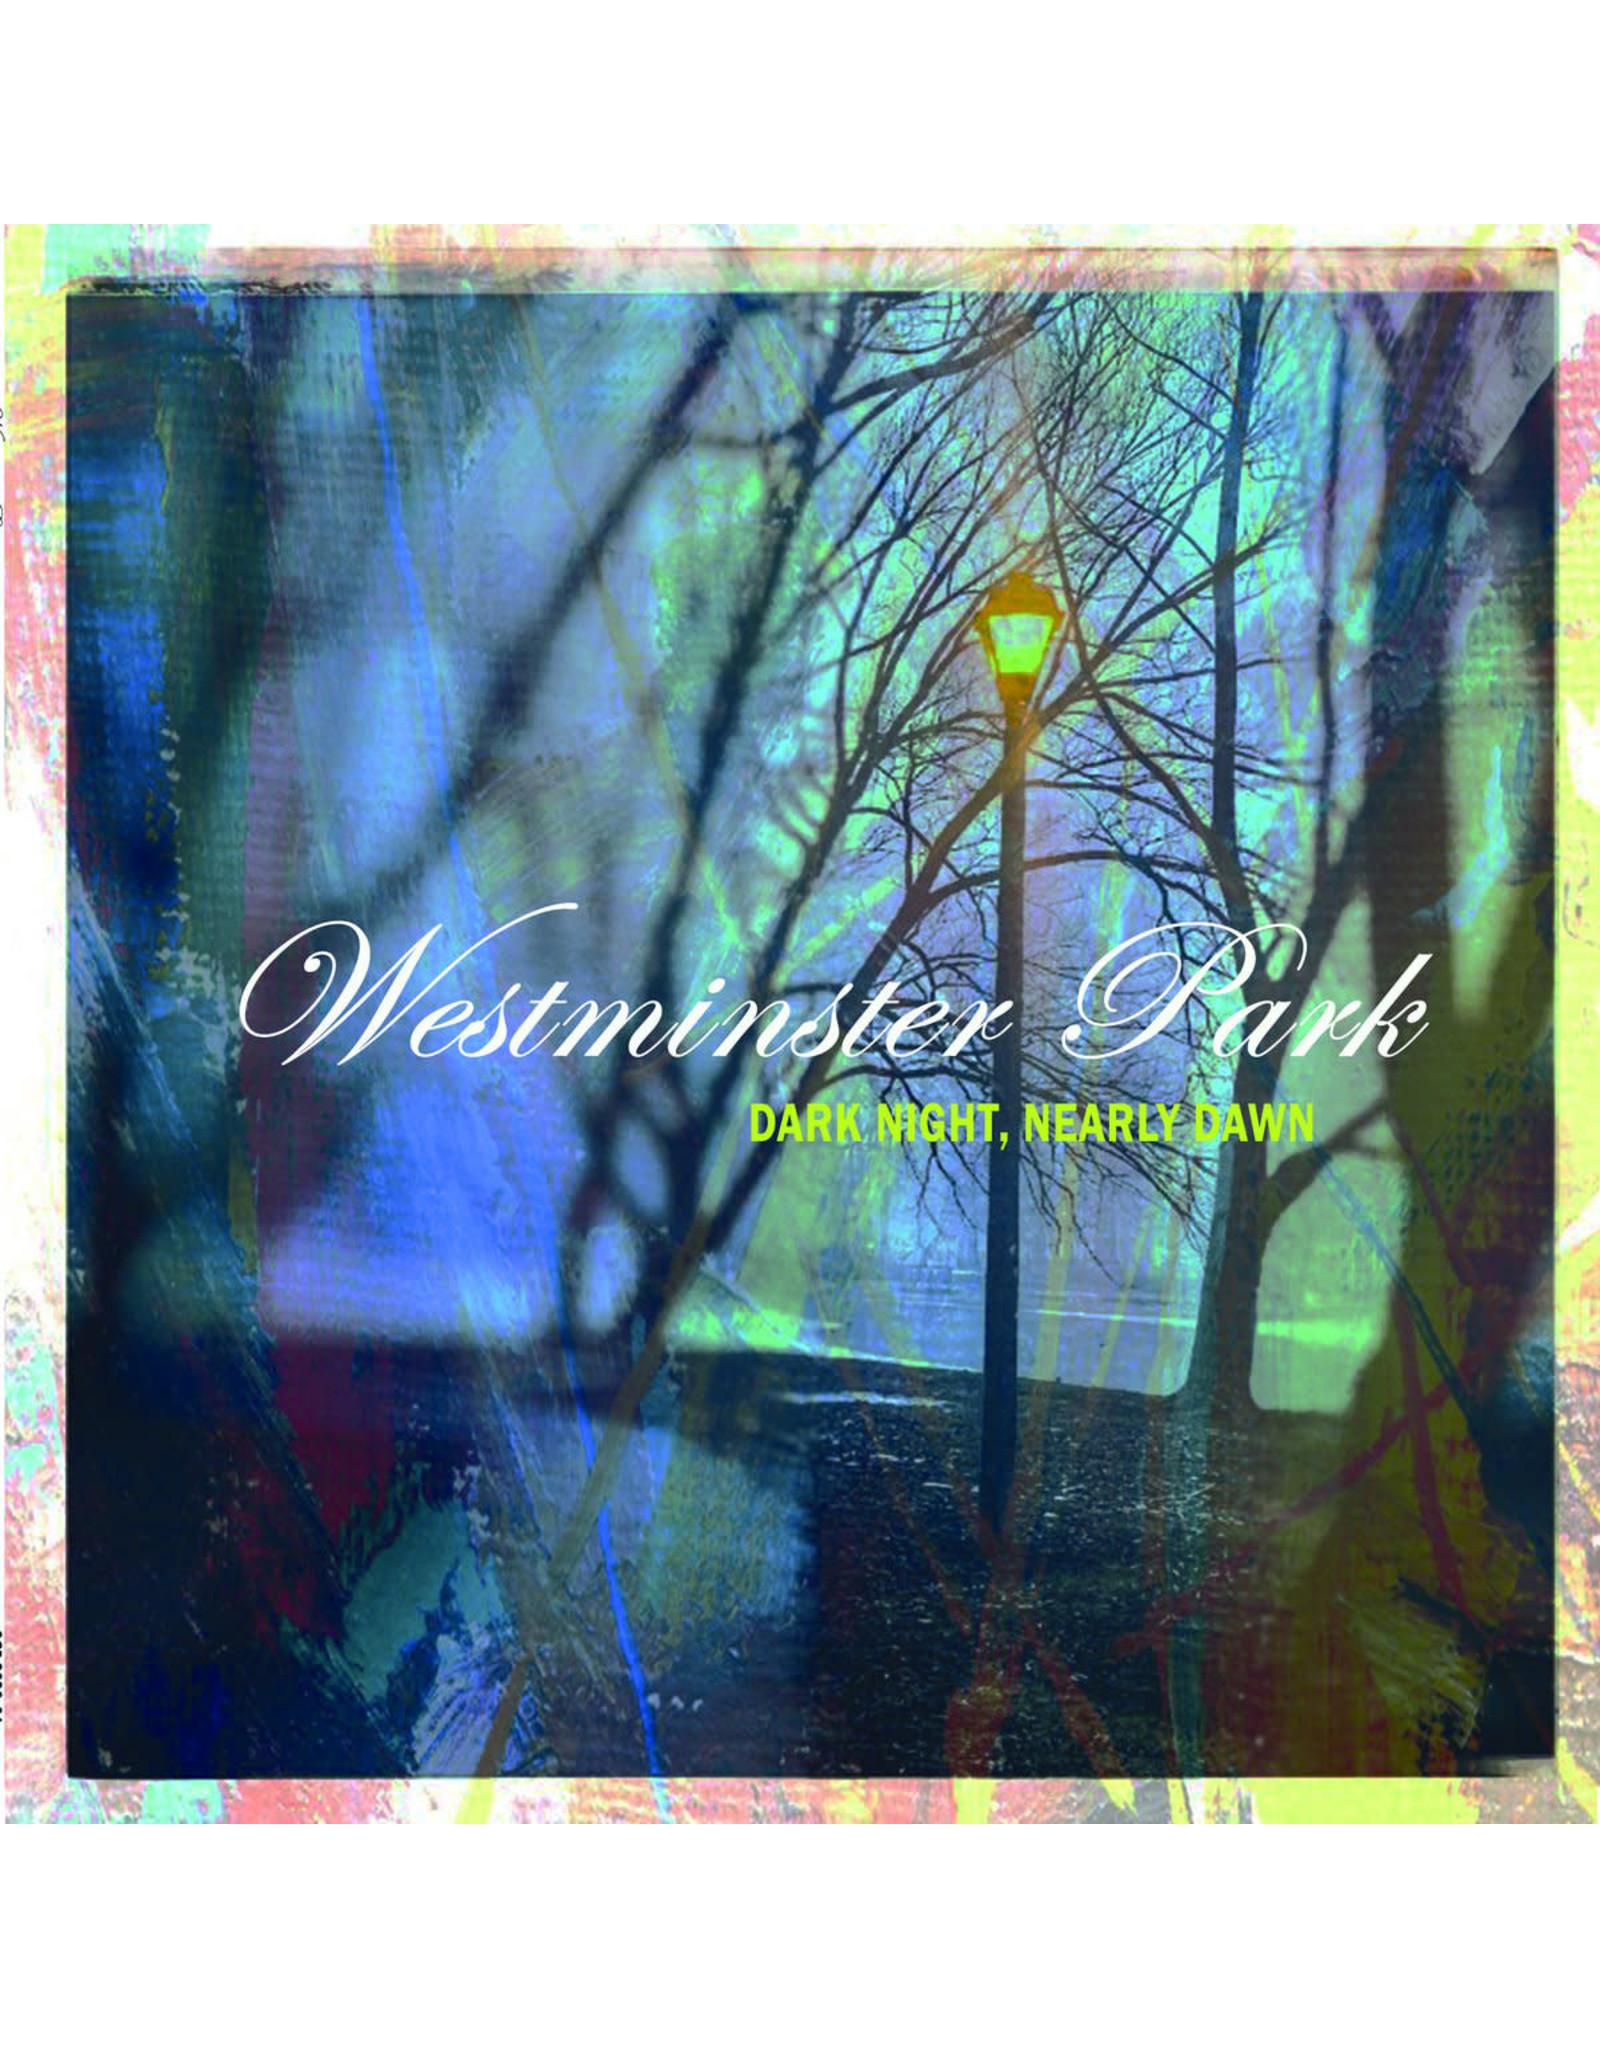 Westminster Park - Dark Night, Nearly Dawn LP